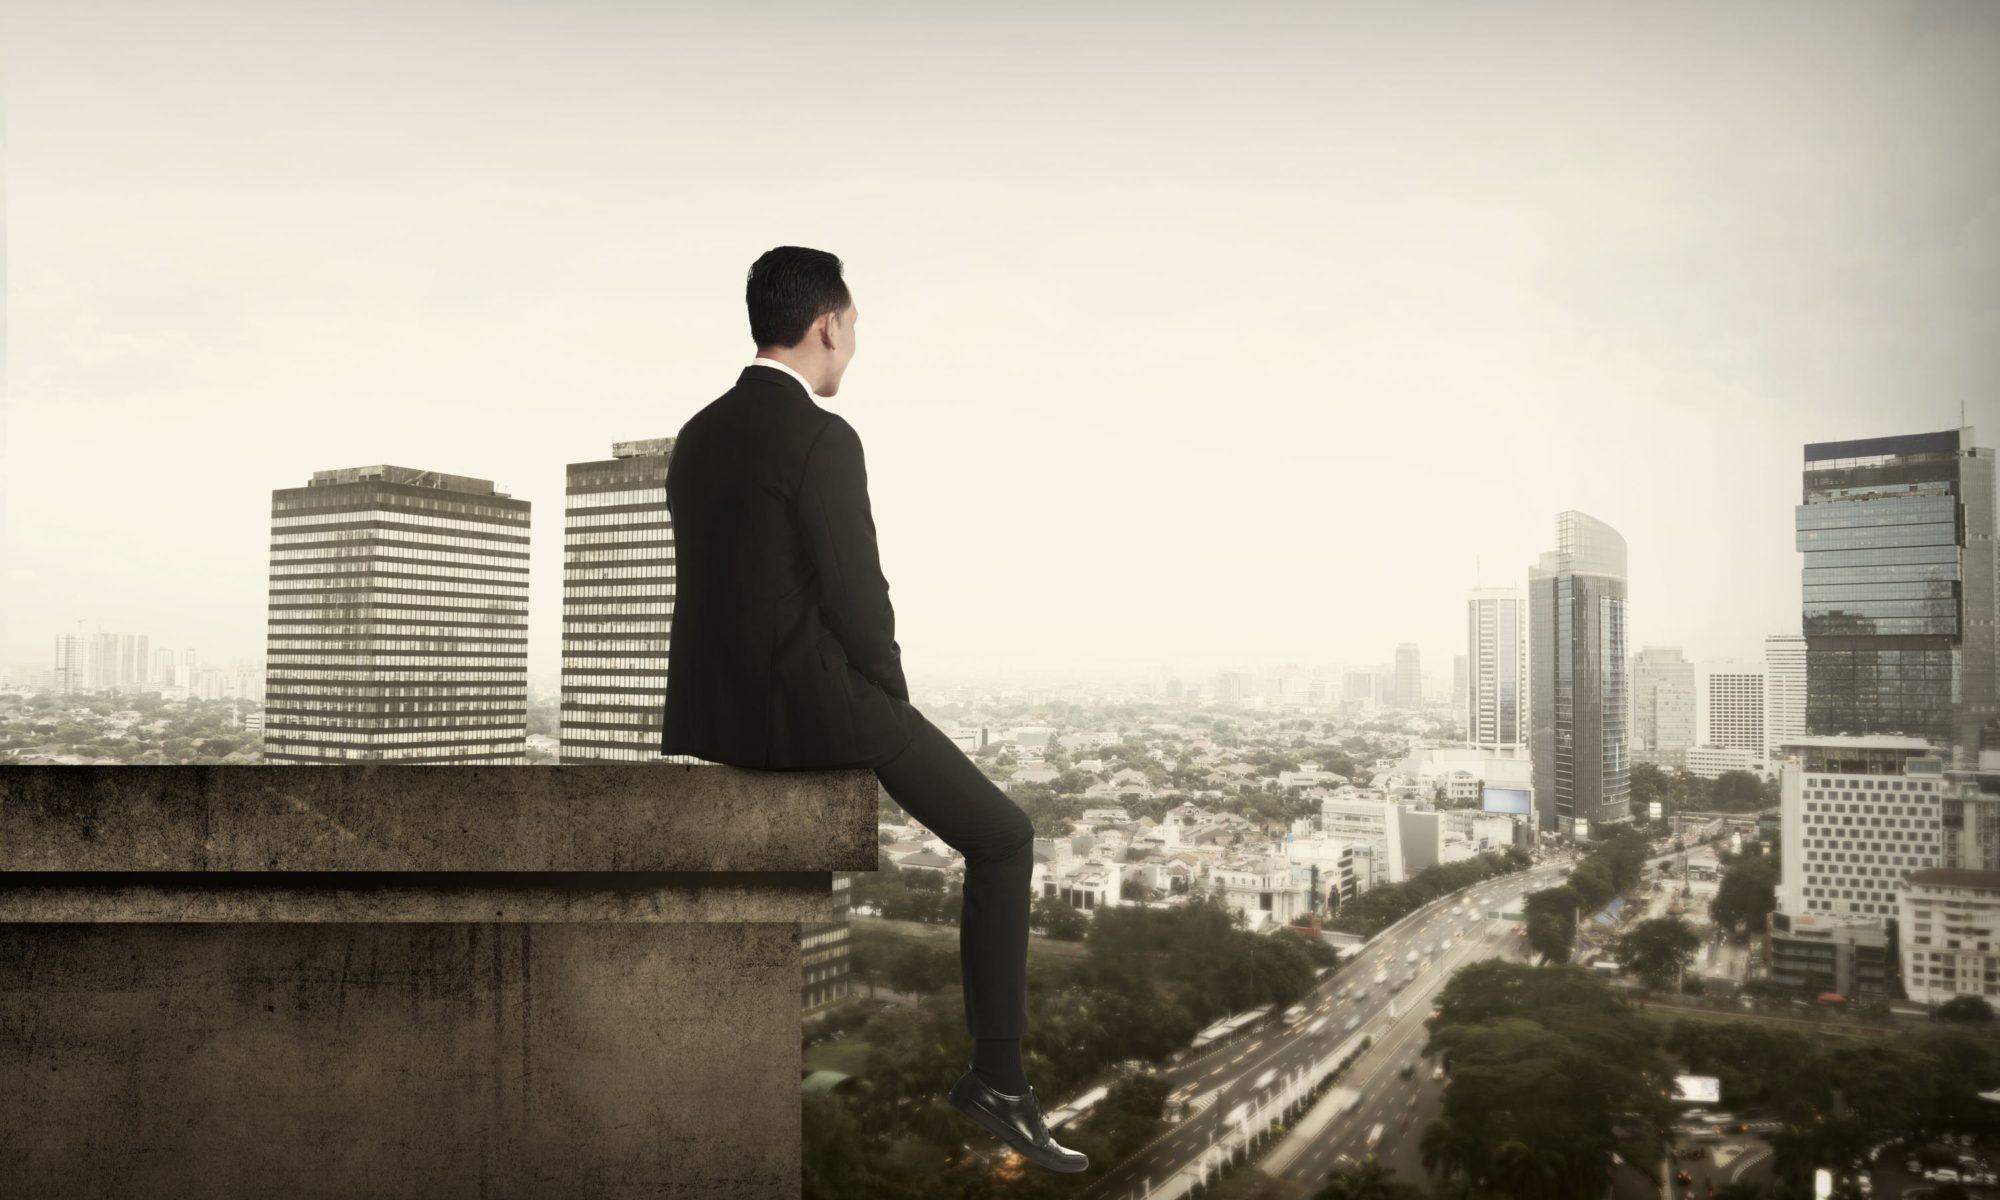 Hal yang Harus Kamu Pertimbangkan Sebelum Menyerah Pada Keadaan